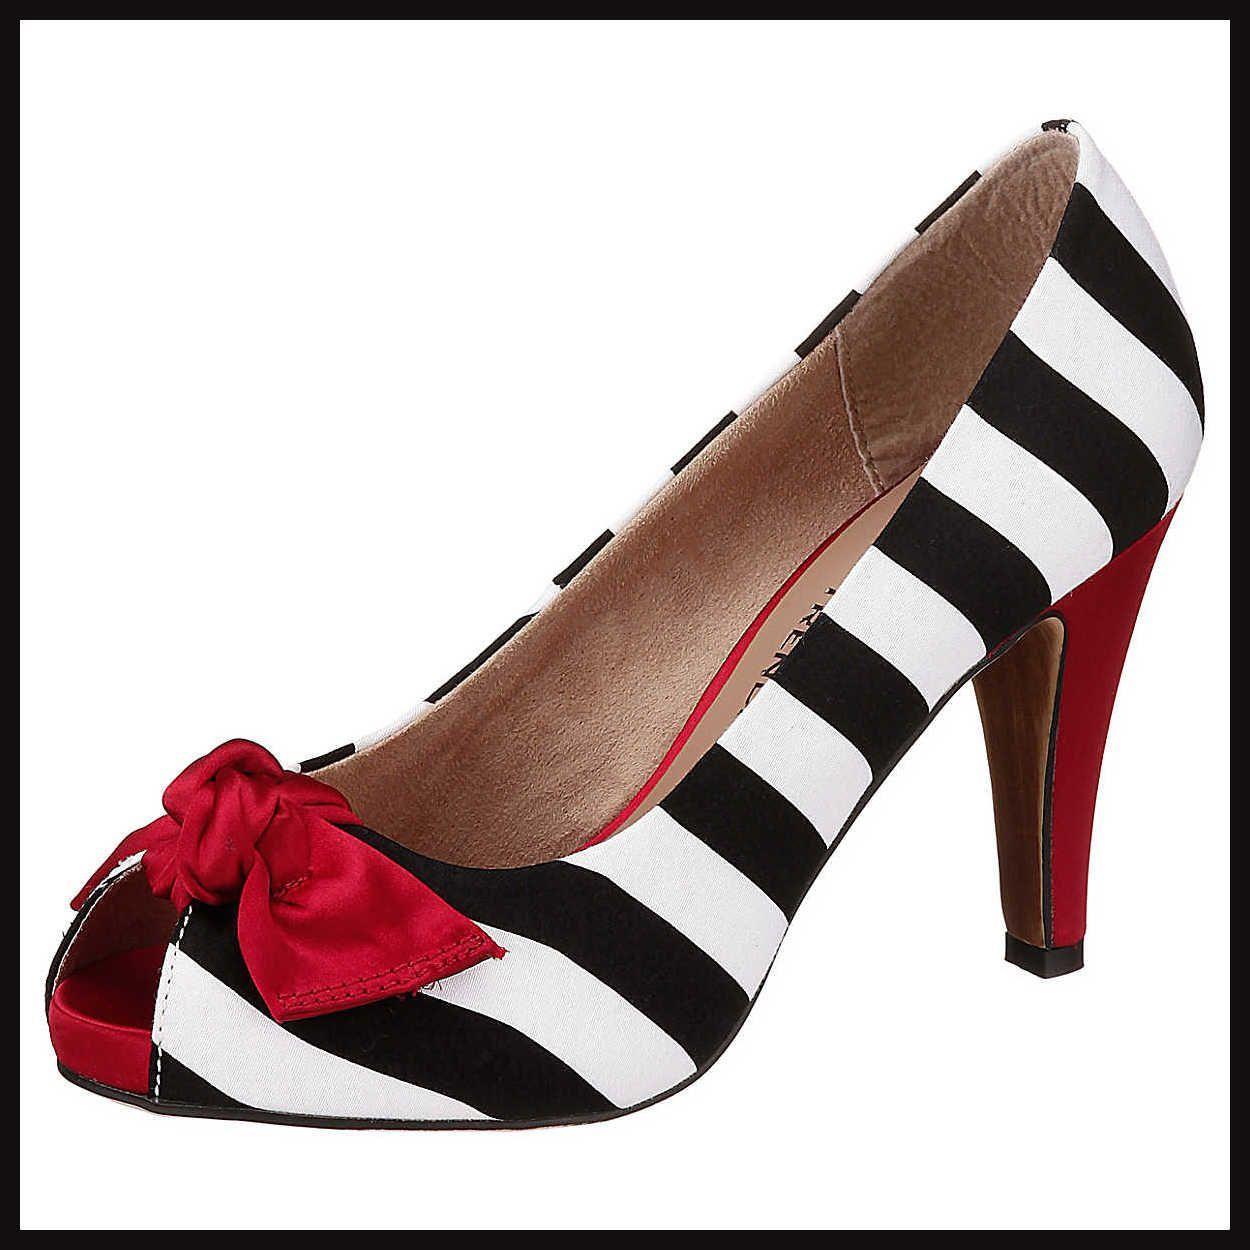 official photos 409d3 23d82 Tamaris Pumps   Love those shoes!   Schuhe, Tamaris schuhe ...